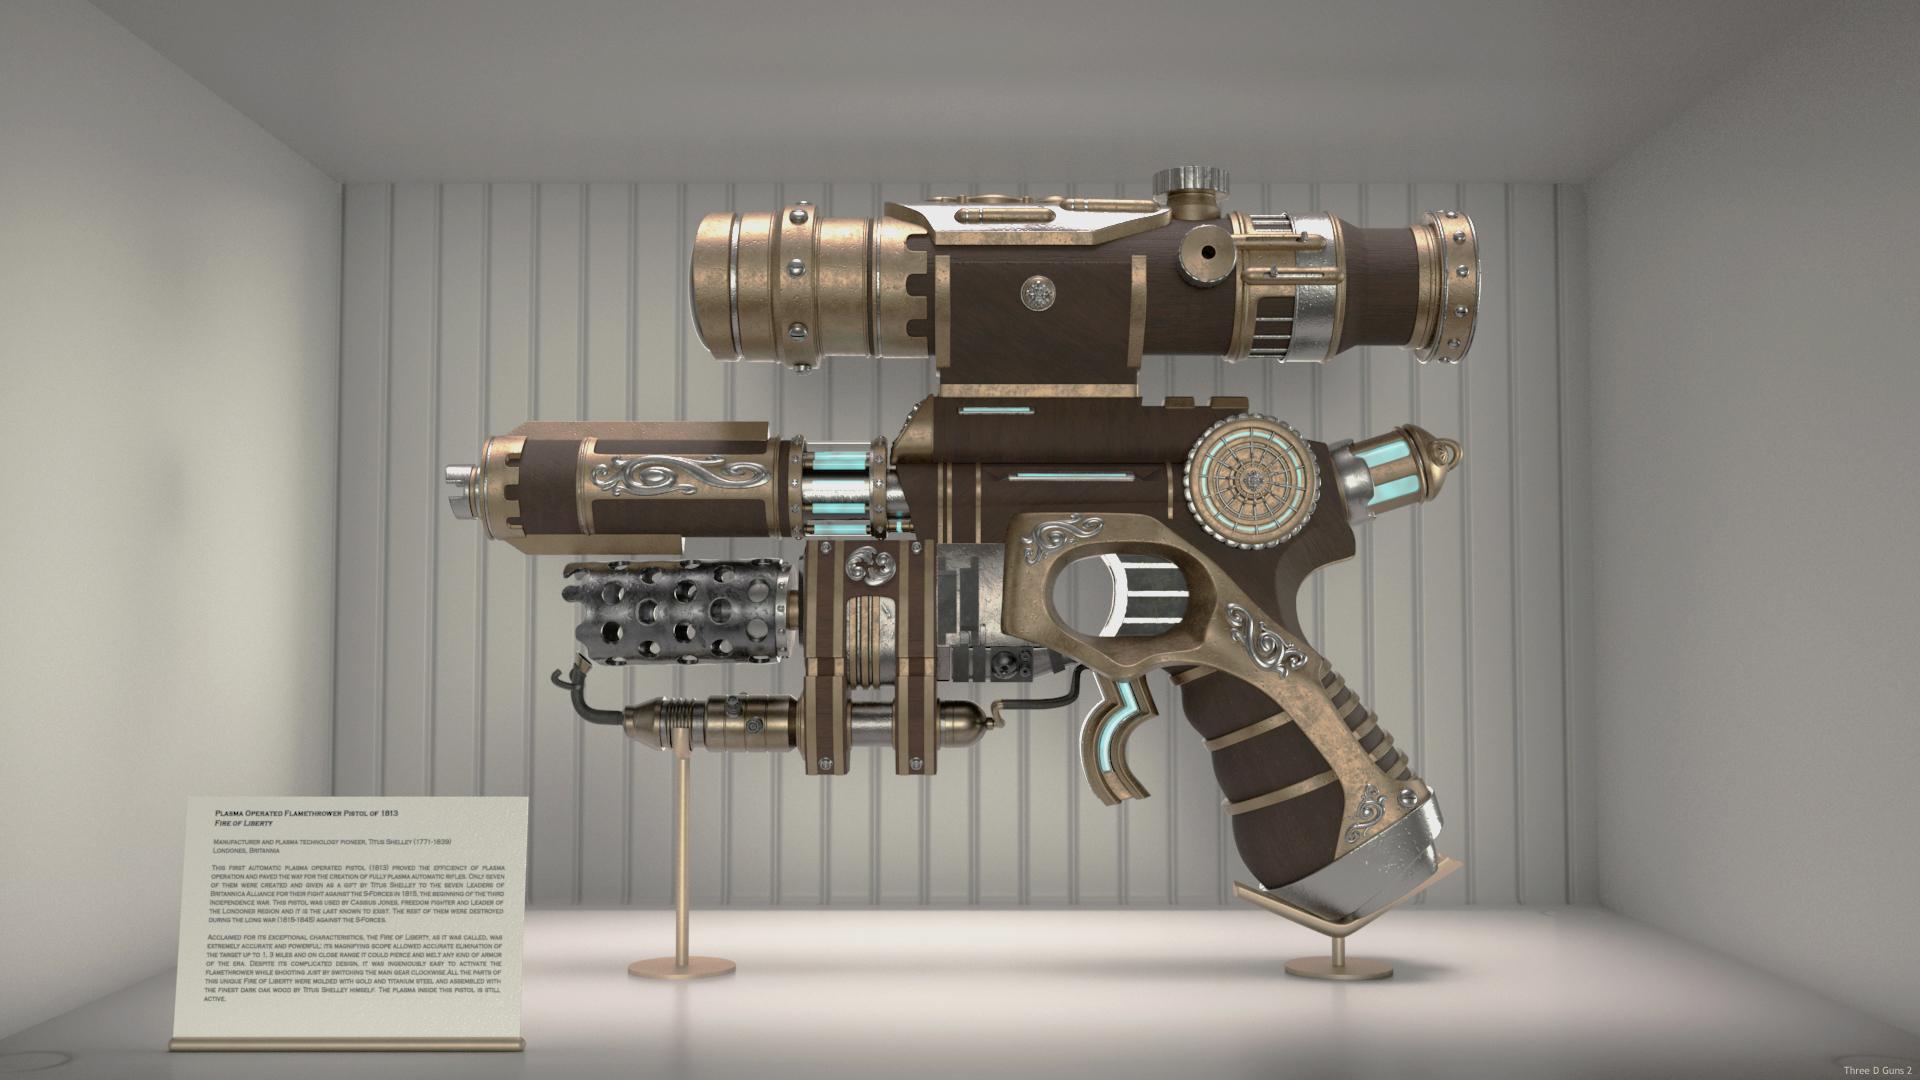 Plasma Operated Flamethrower Pistol of 1813-Fire of Liberty 3d art